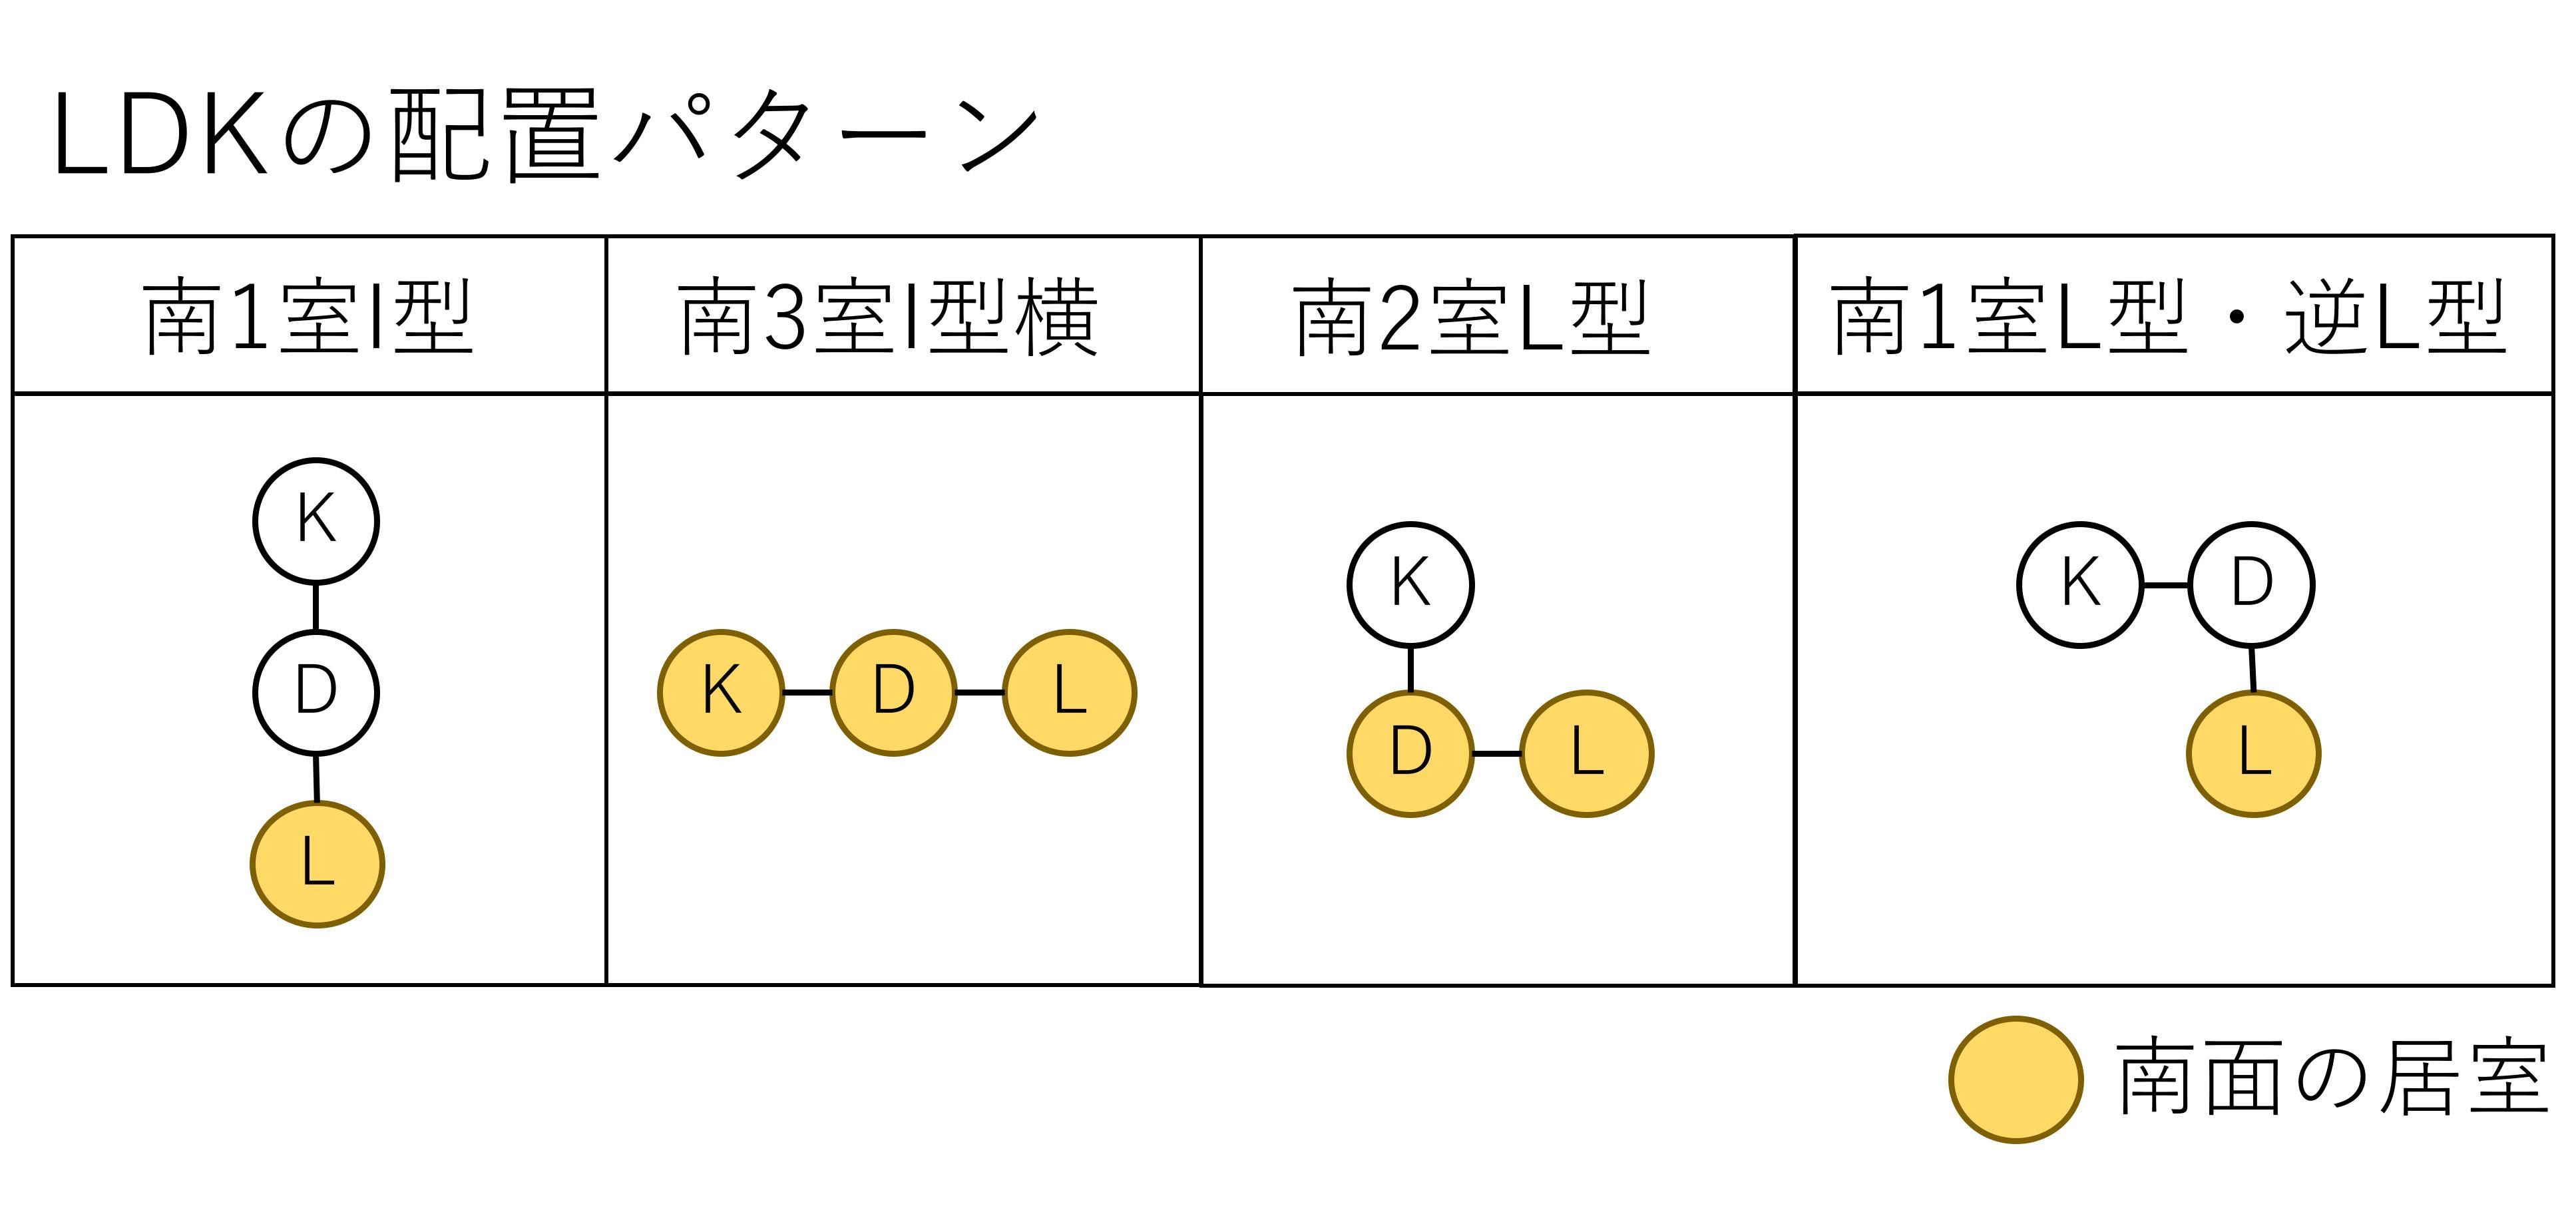 LDKの配置を主に4つのタイプに分類(資料:住環境研究所のデータを基に日経ホームビルダーが作成)